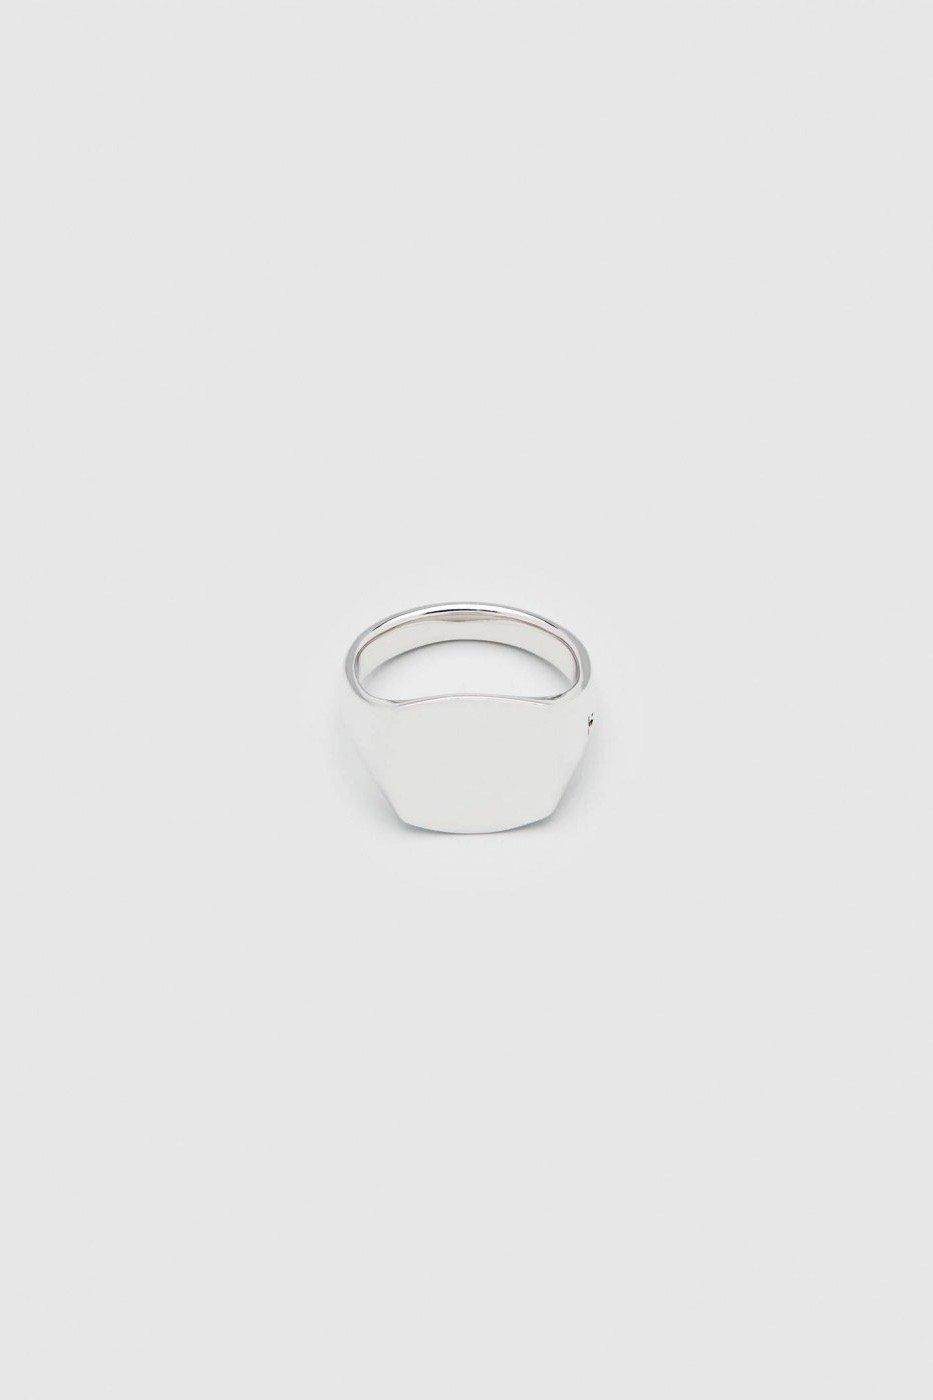 <img class='new_mark_img1' src='https://img.shop-pro.jp/img/new/icons5.gif' style='border:none;display:inline;margin:0px;padding:0px;width:auto;' />TOM WOOD トムウッド-Mini Signet Cushion Ring-